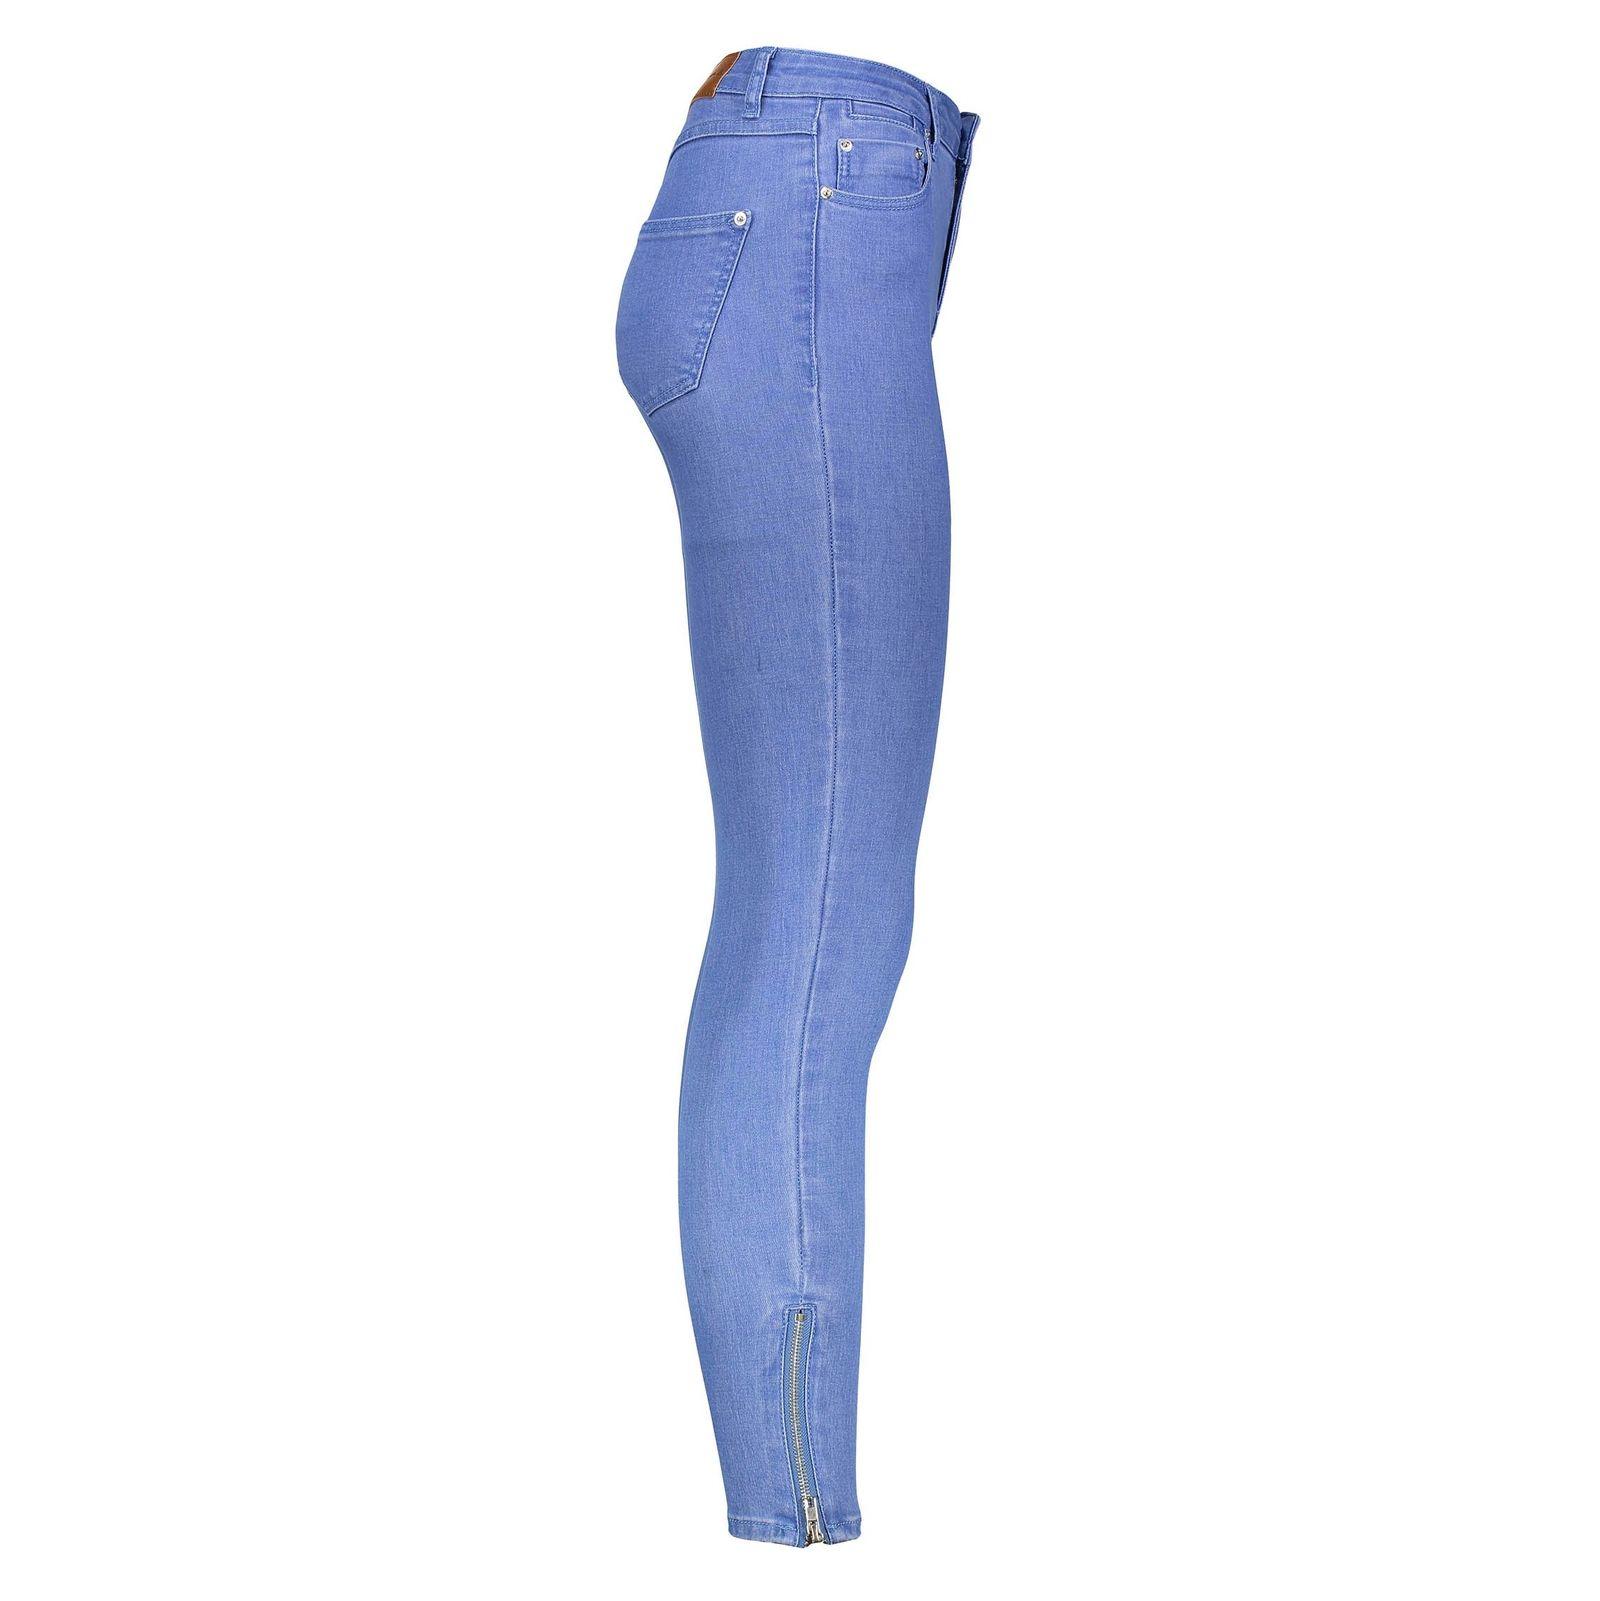 شلوار جین جذب زنانه - جنیفر - آبي - 3